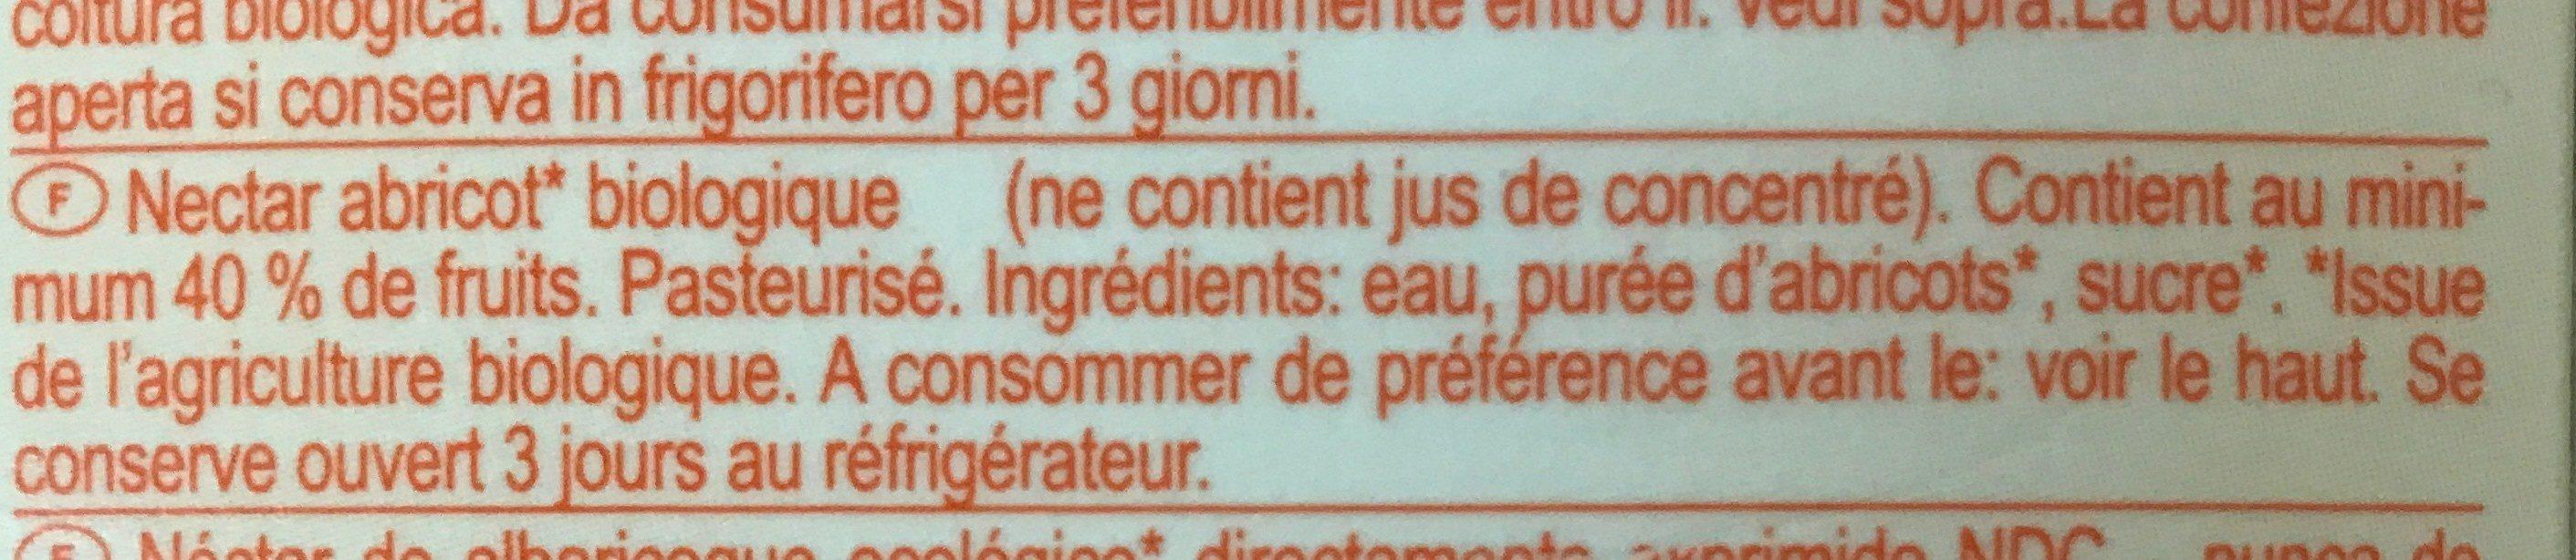 Nectar Abricot Tetra - Ingredients